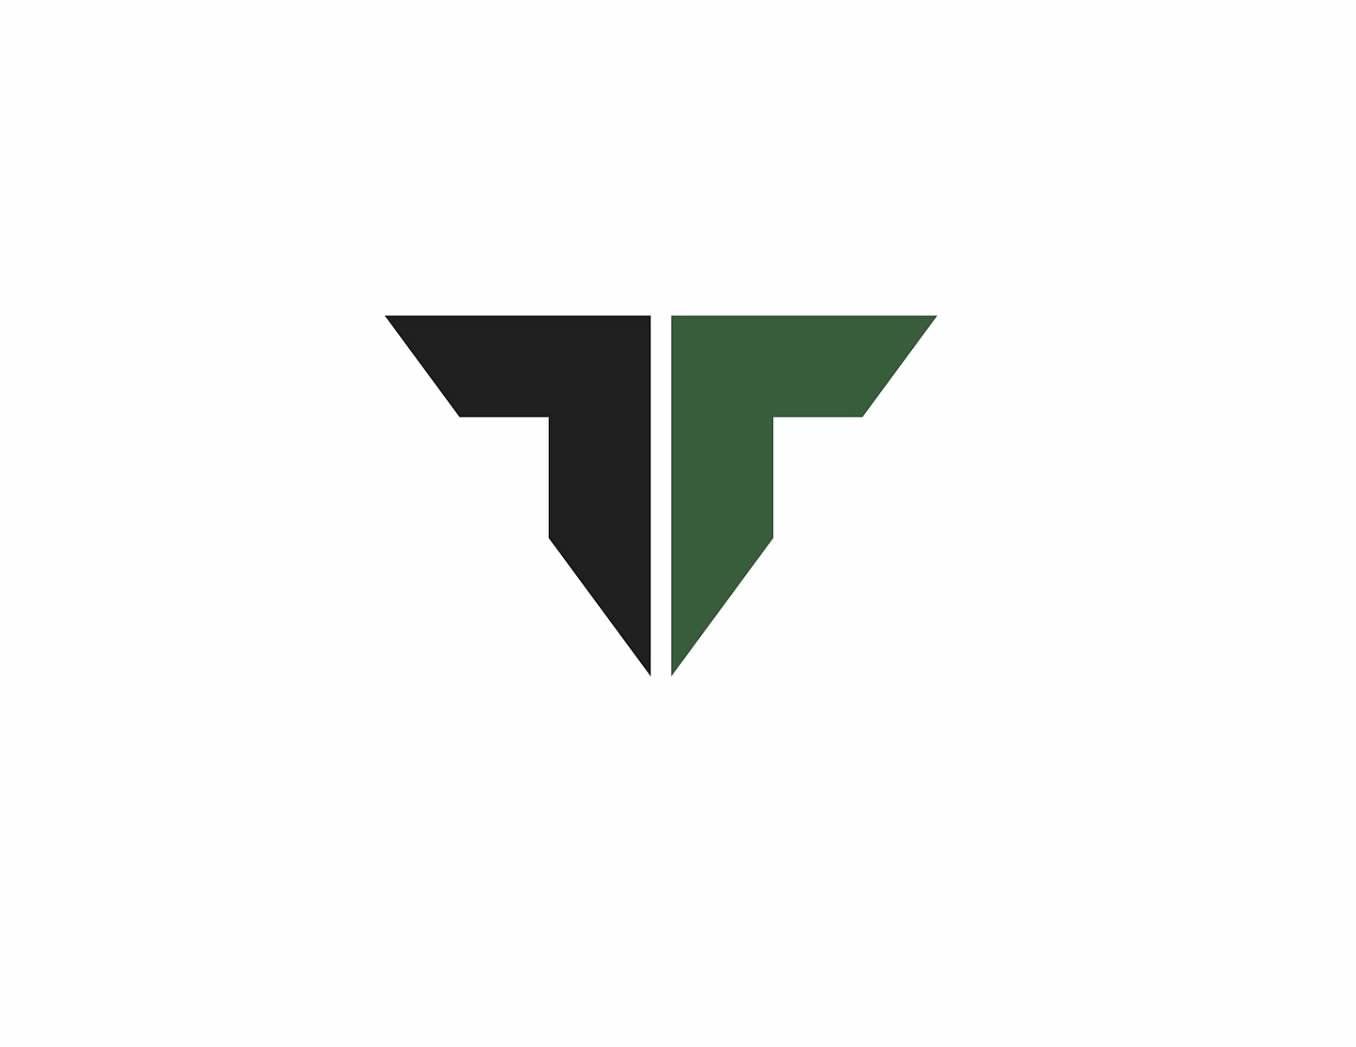 Tigard Youth Football - TVYFL - Tigard 5/6 White